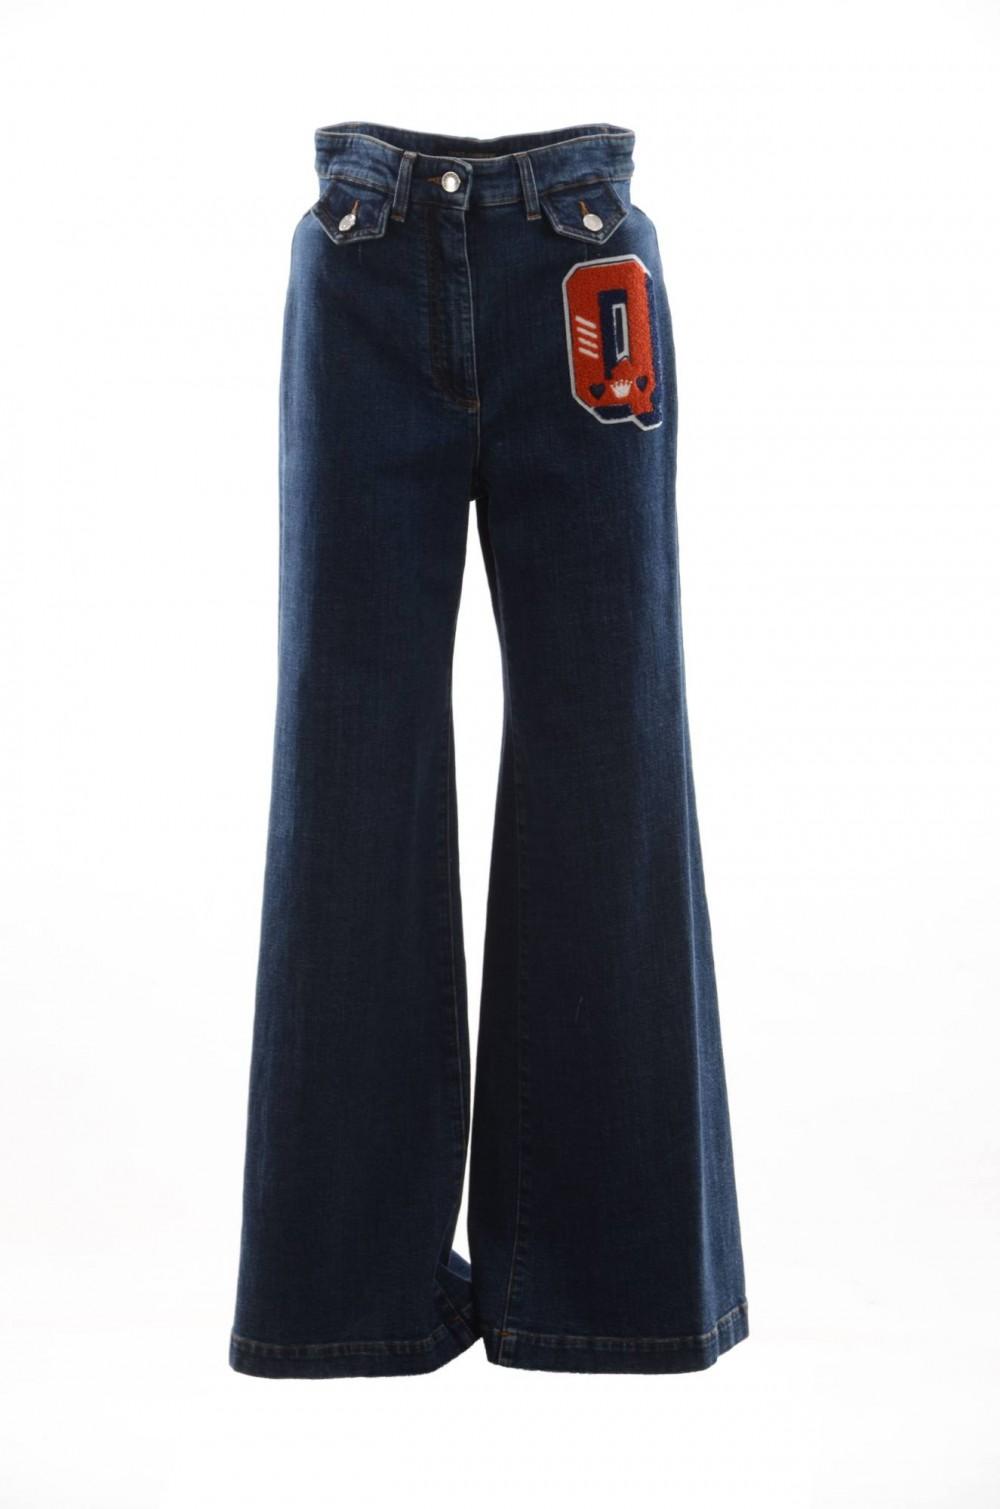 Dolce Gabbana Pantalones Acampanados Denim Mujer Fta61z G889r